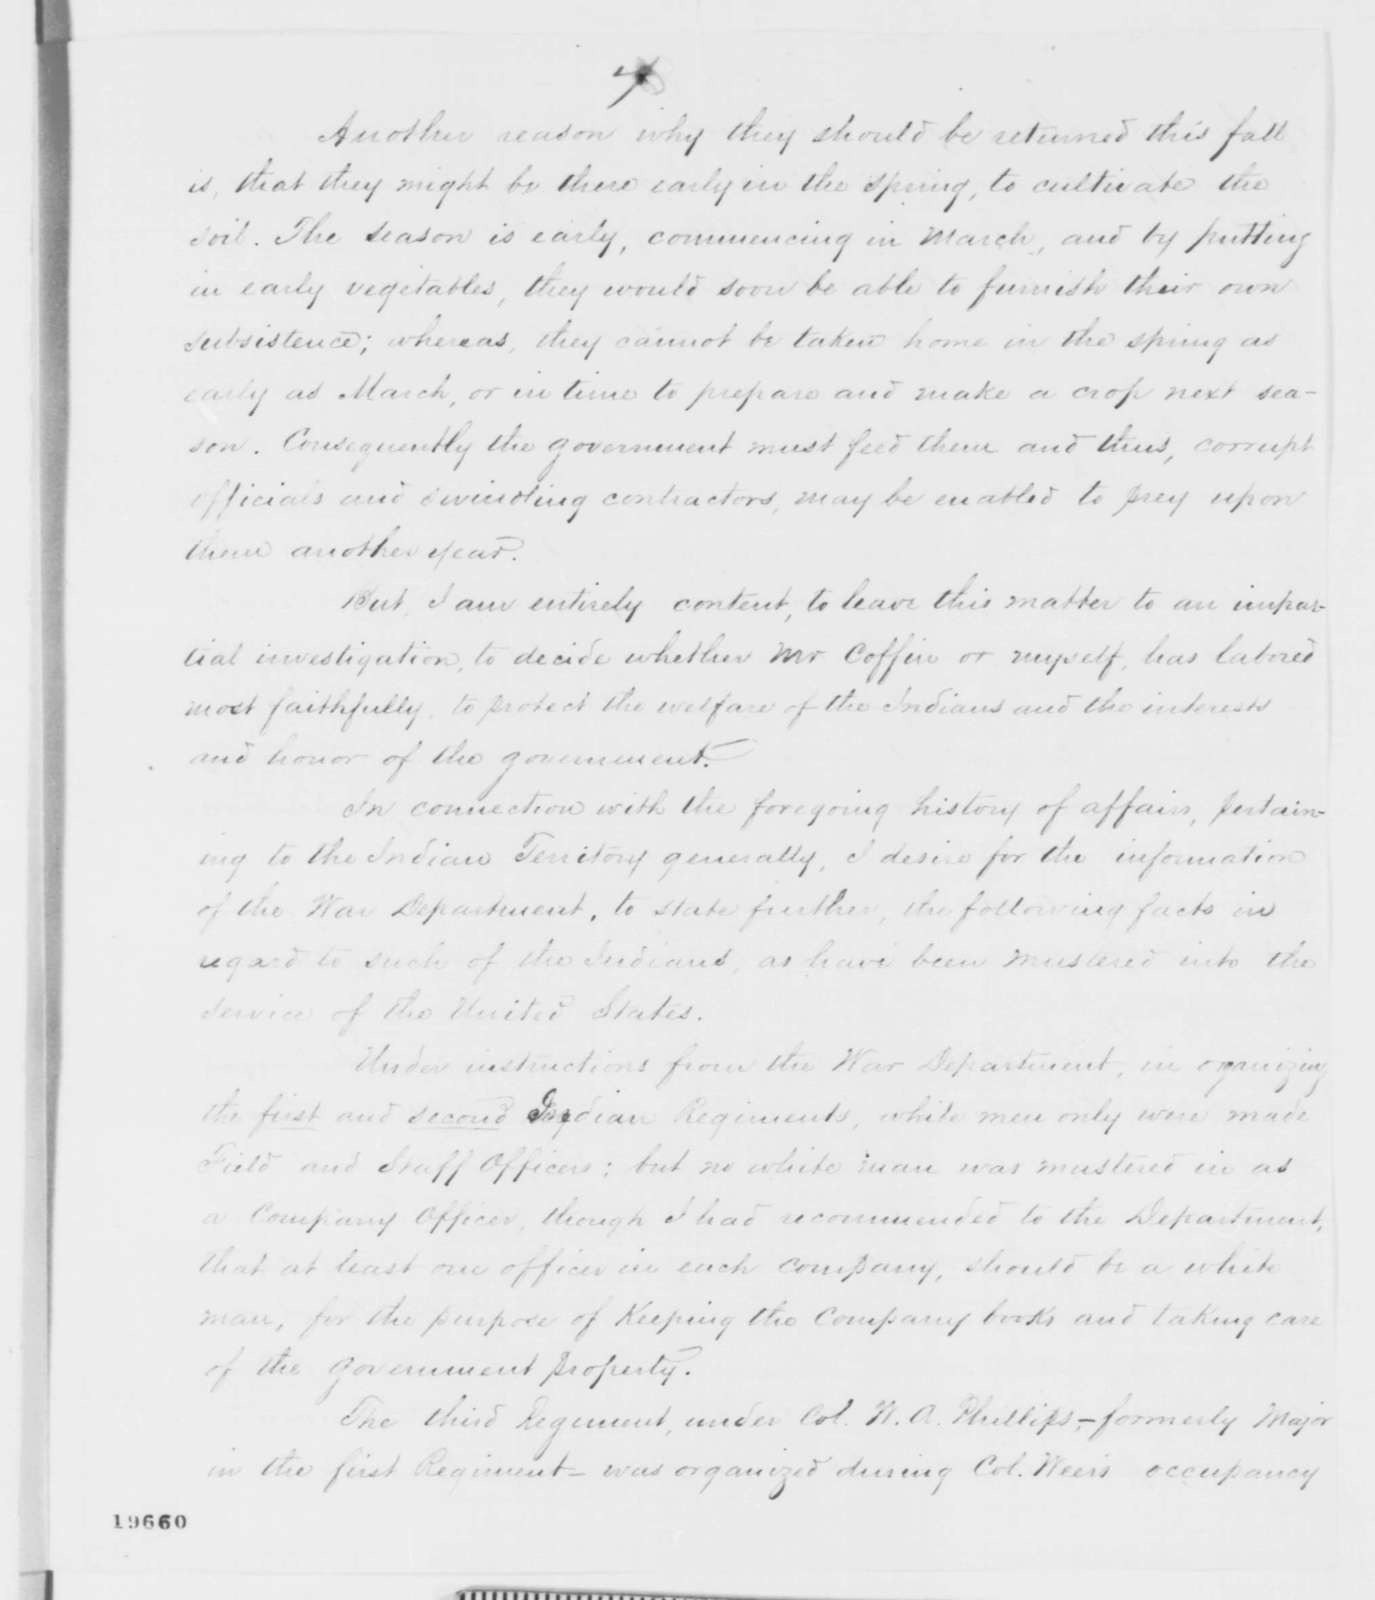 James G. Blunt to Caleb Smith, Friday, November 21, 1862  (Refugee Indians in Kansas)